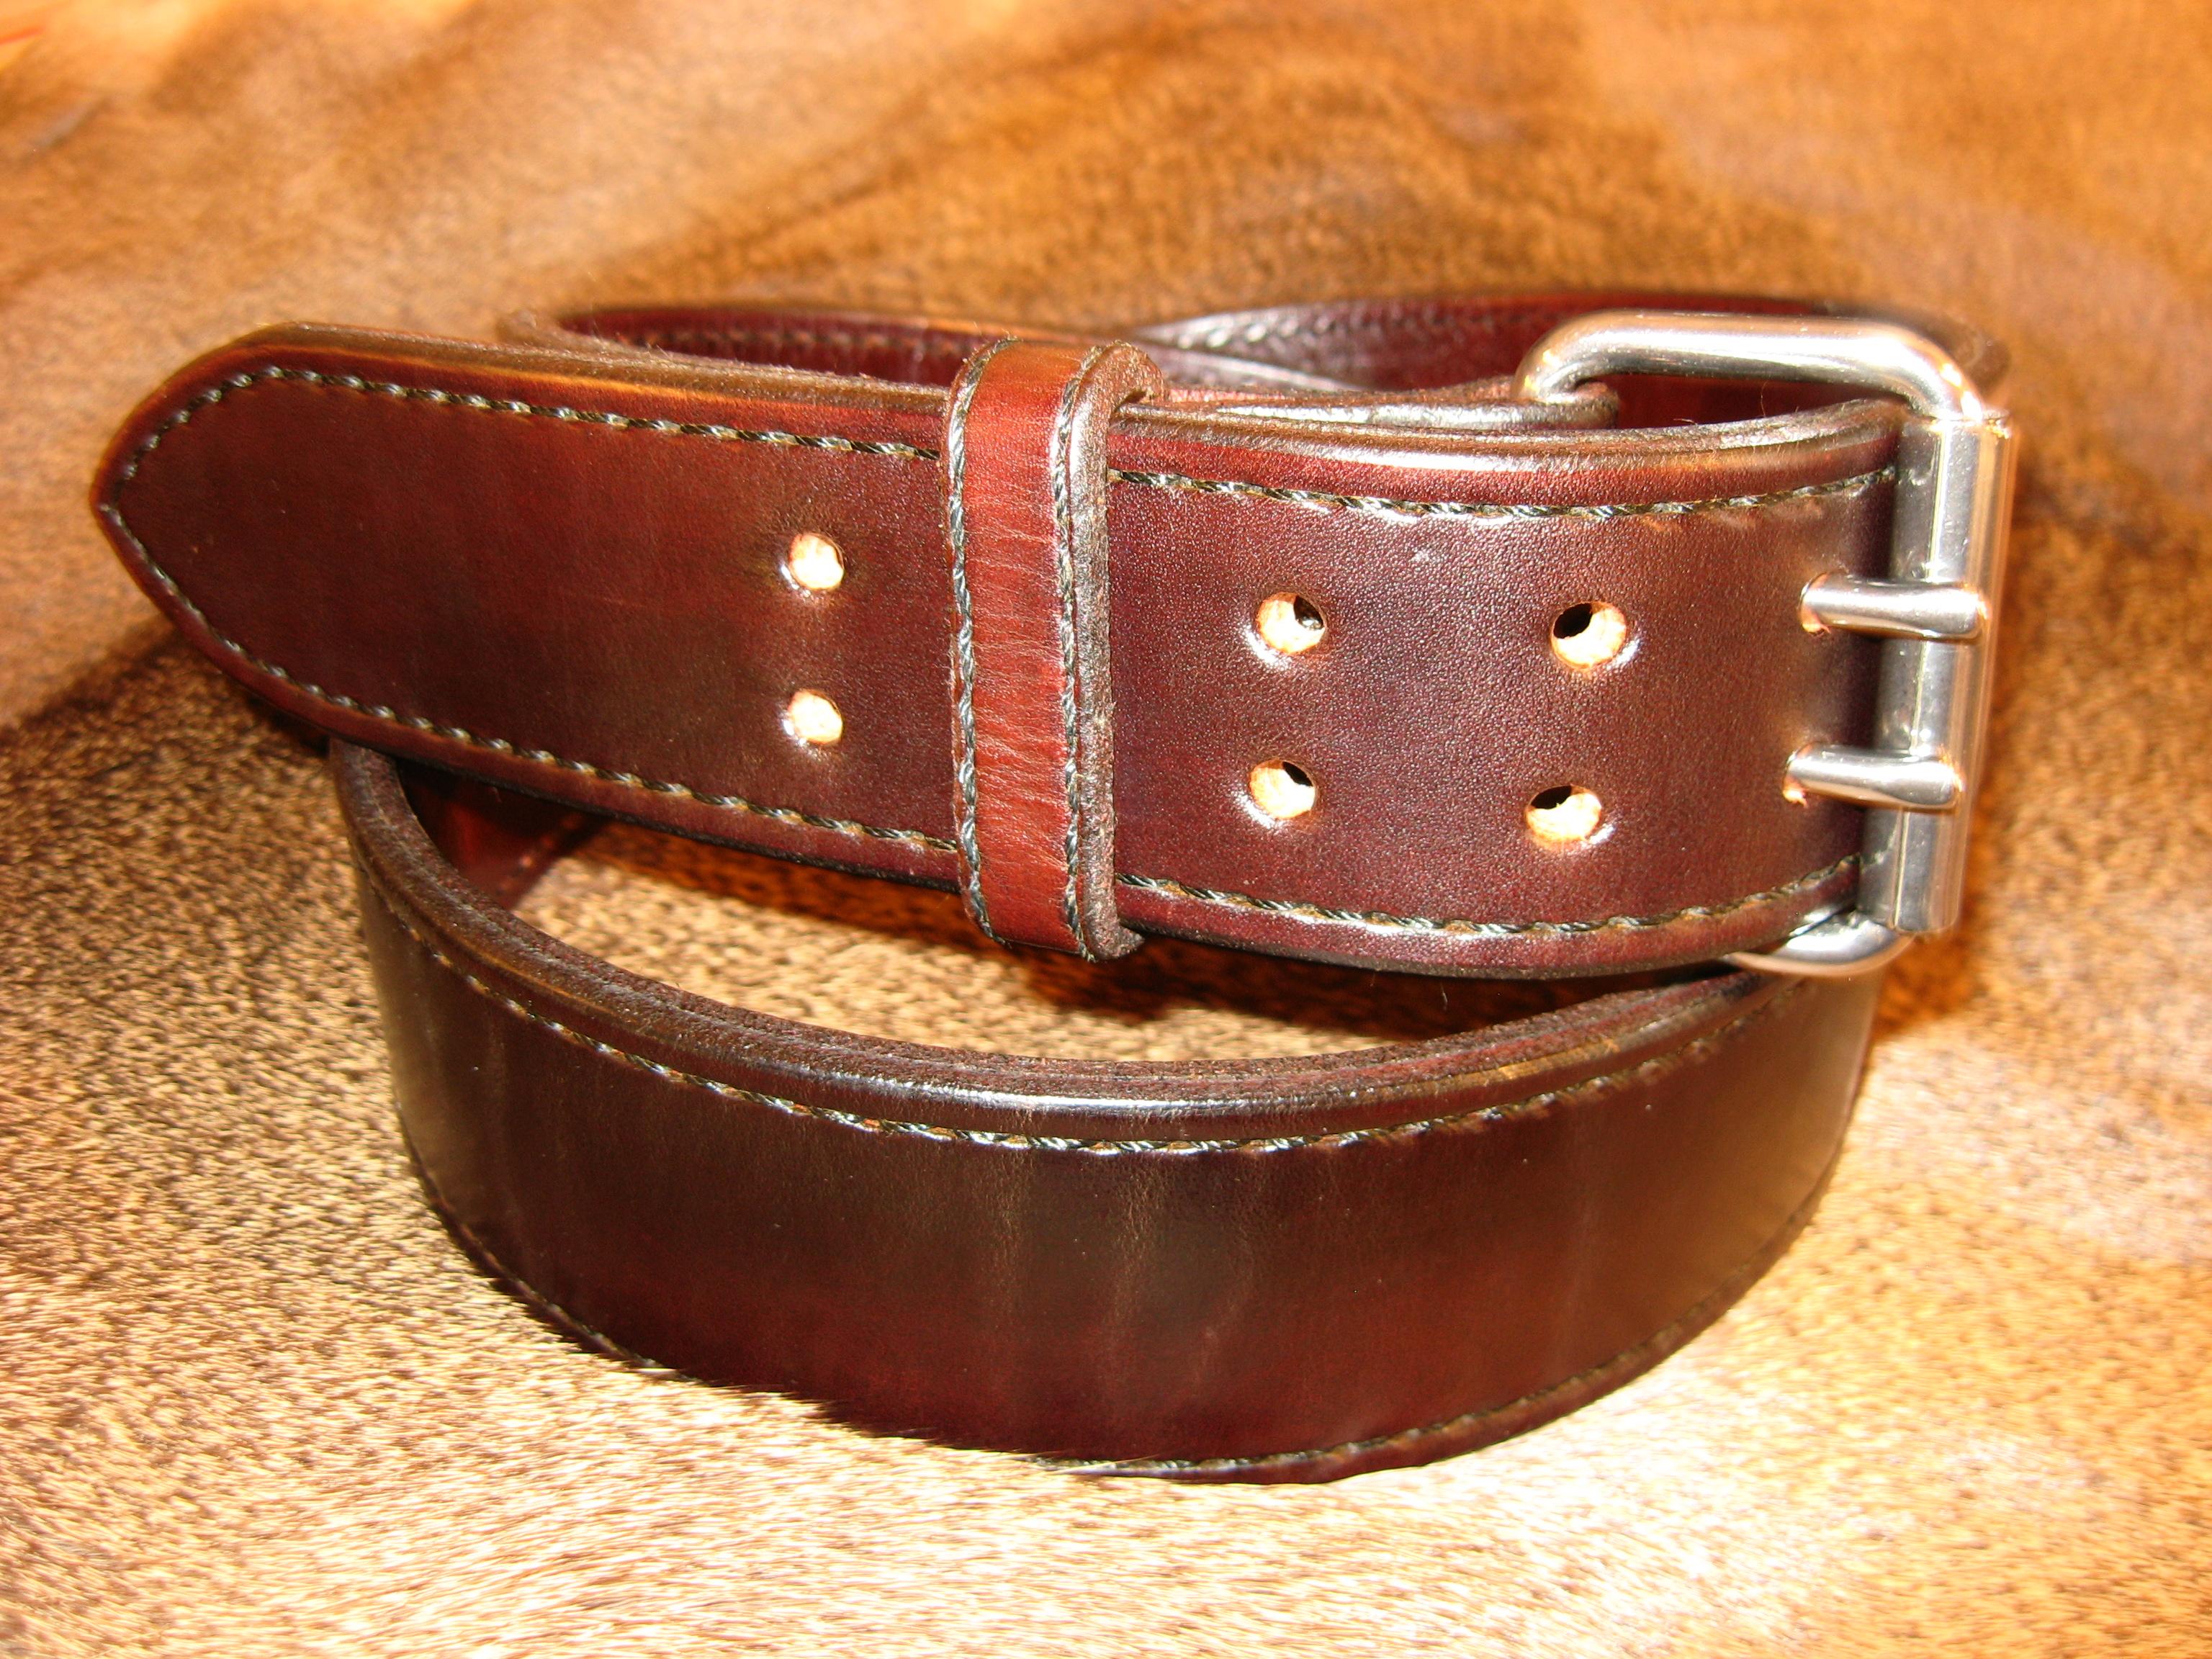 U201cheavy Duty Gun Belt U201d Double Leather With A Width Of 2